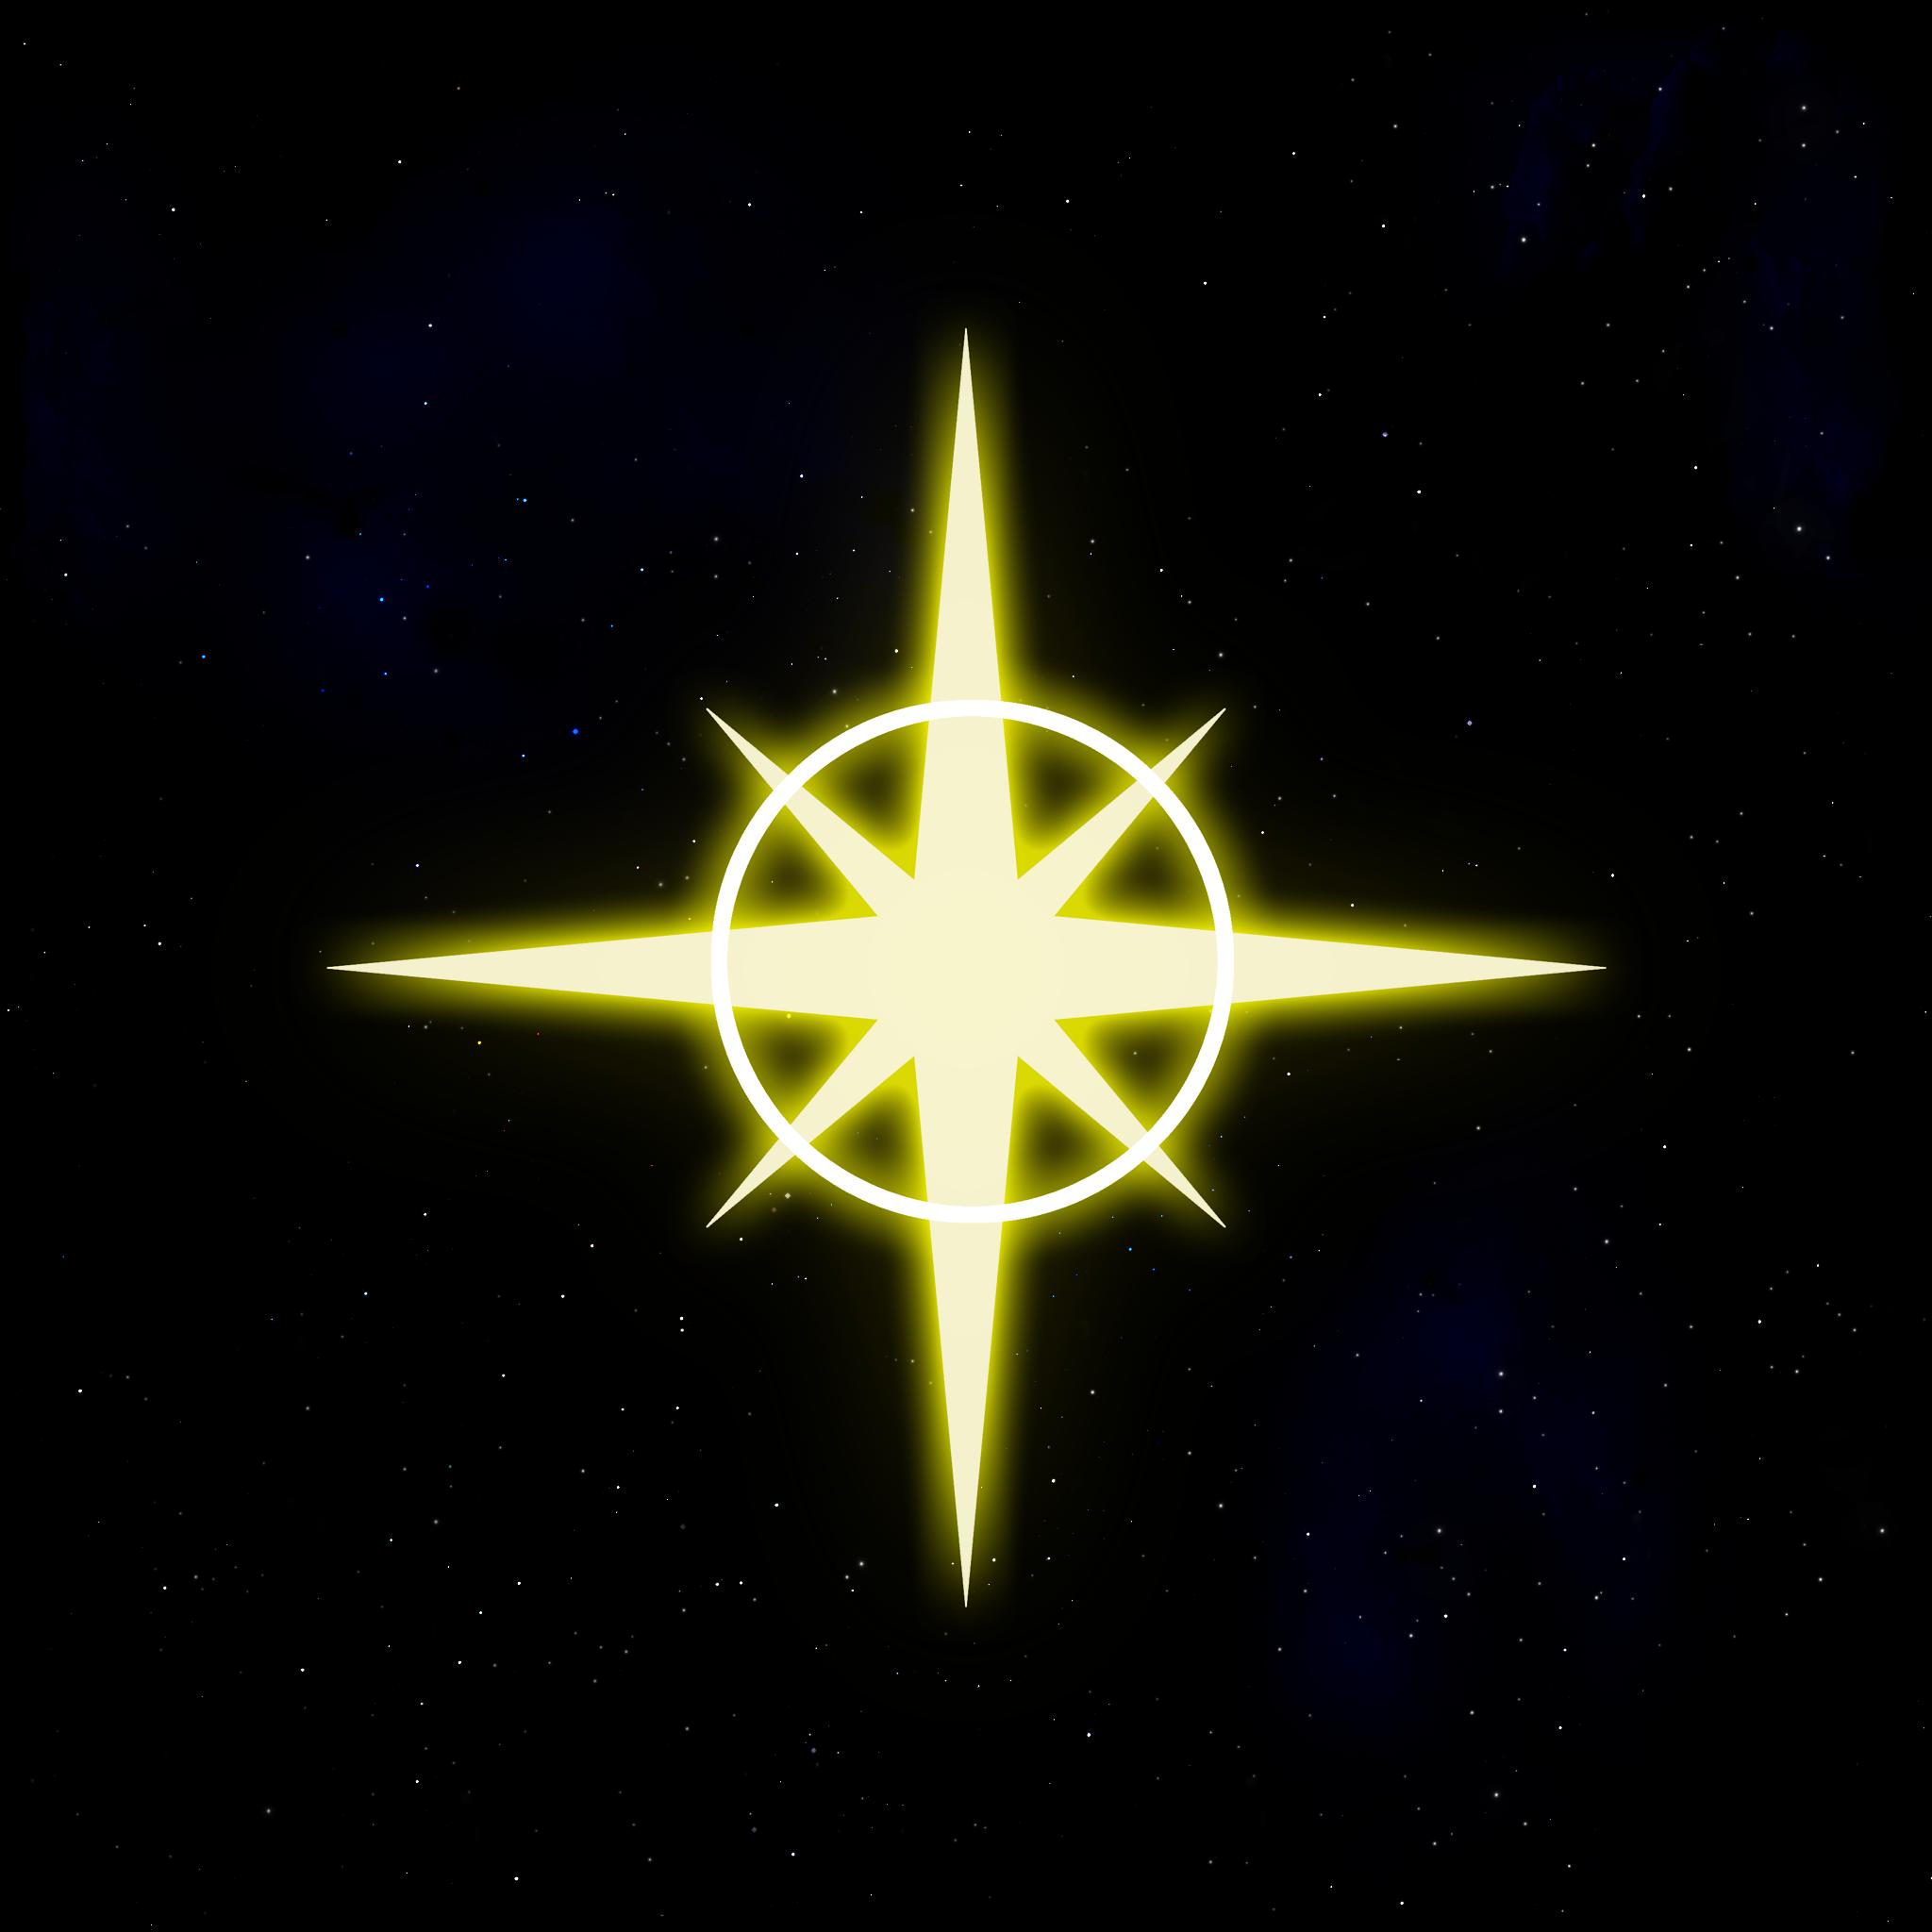 The Eradicator Star item